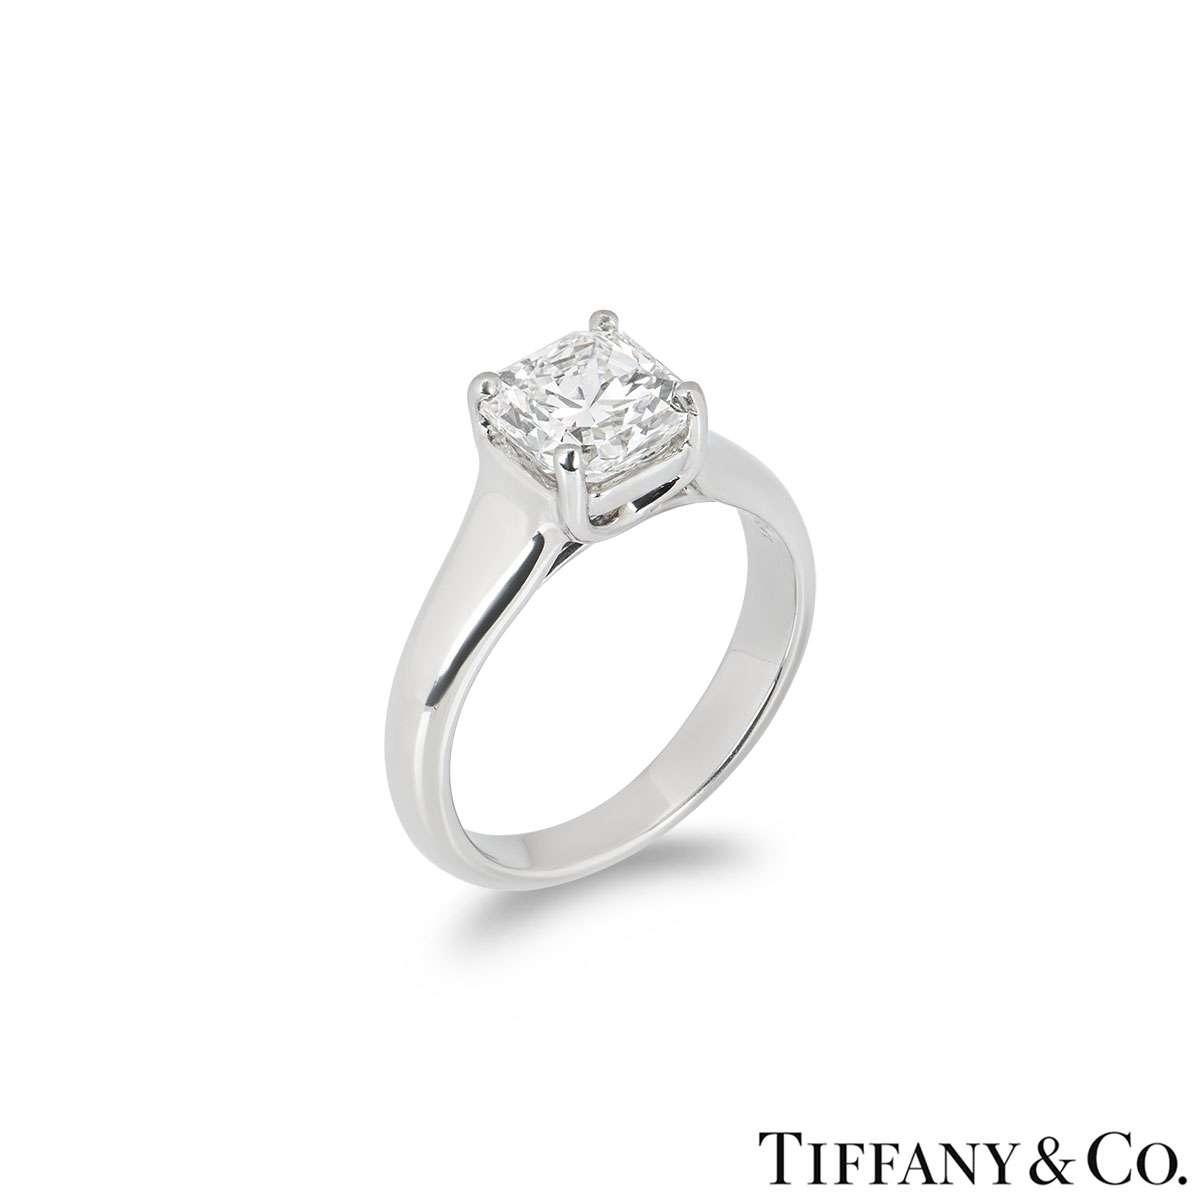 Tiffany & Co. Lucida Cut Diamond Ring 1.61ct H/IF